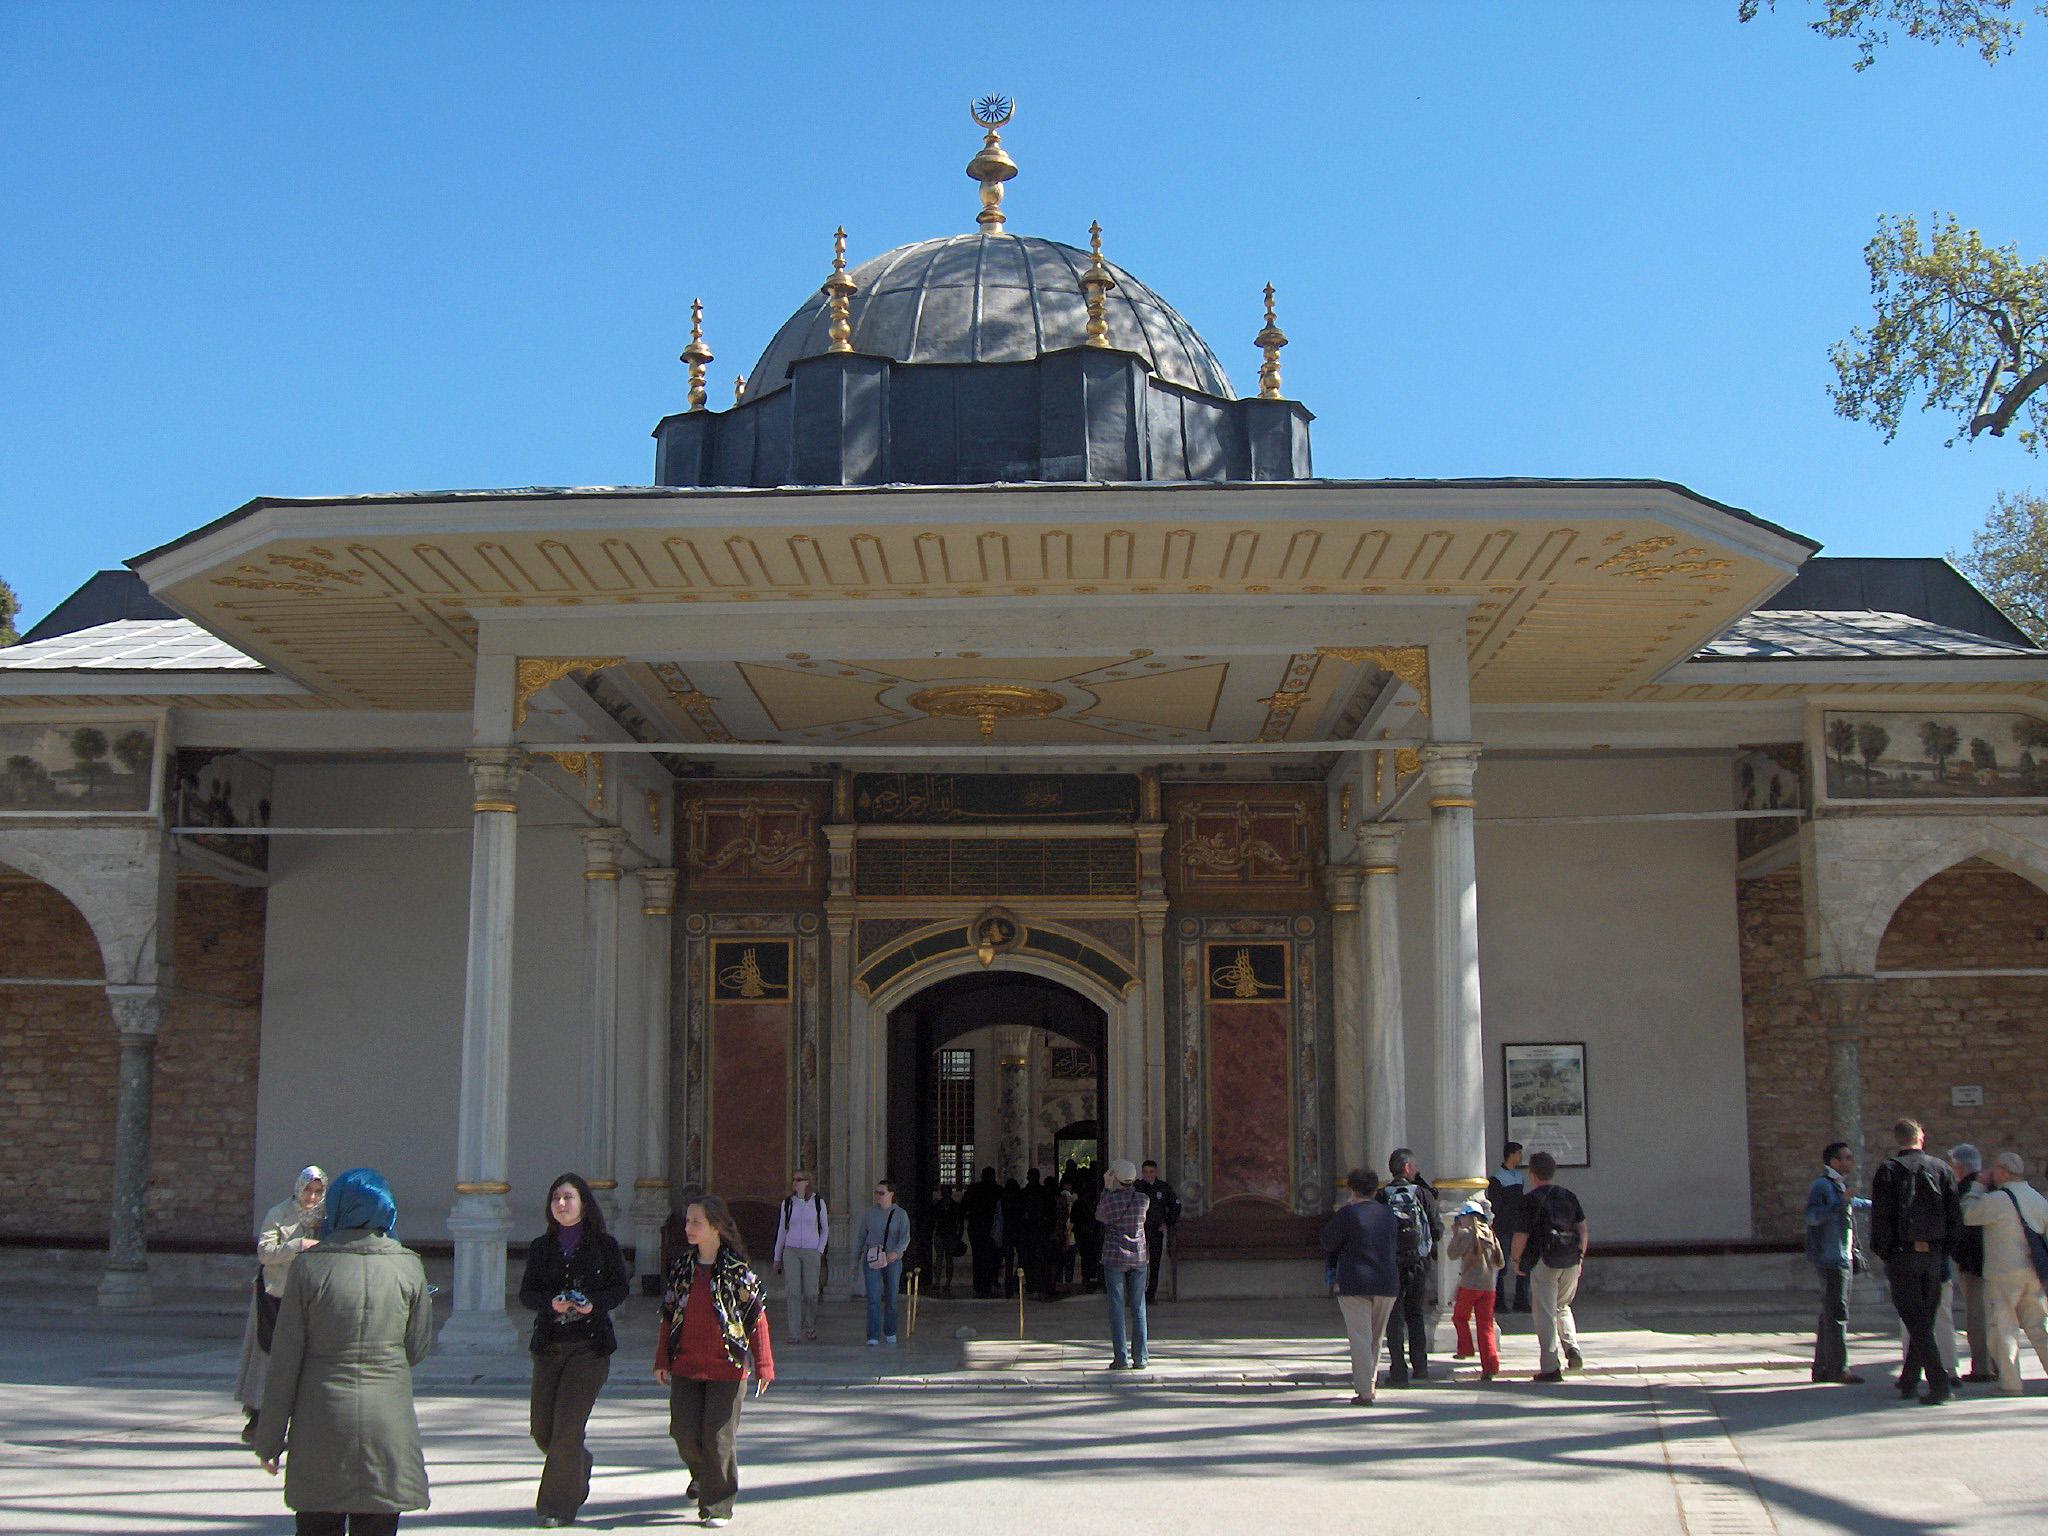 File:Istanbul.Topkapi036.jpg - Wikimedia Commons